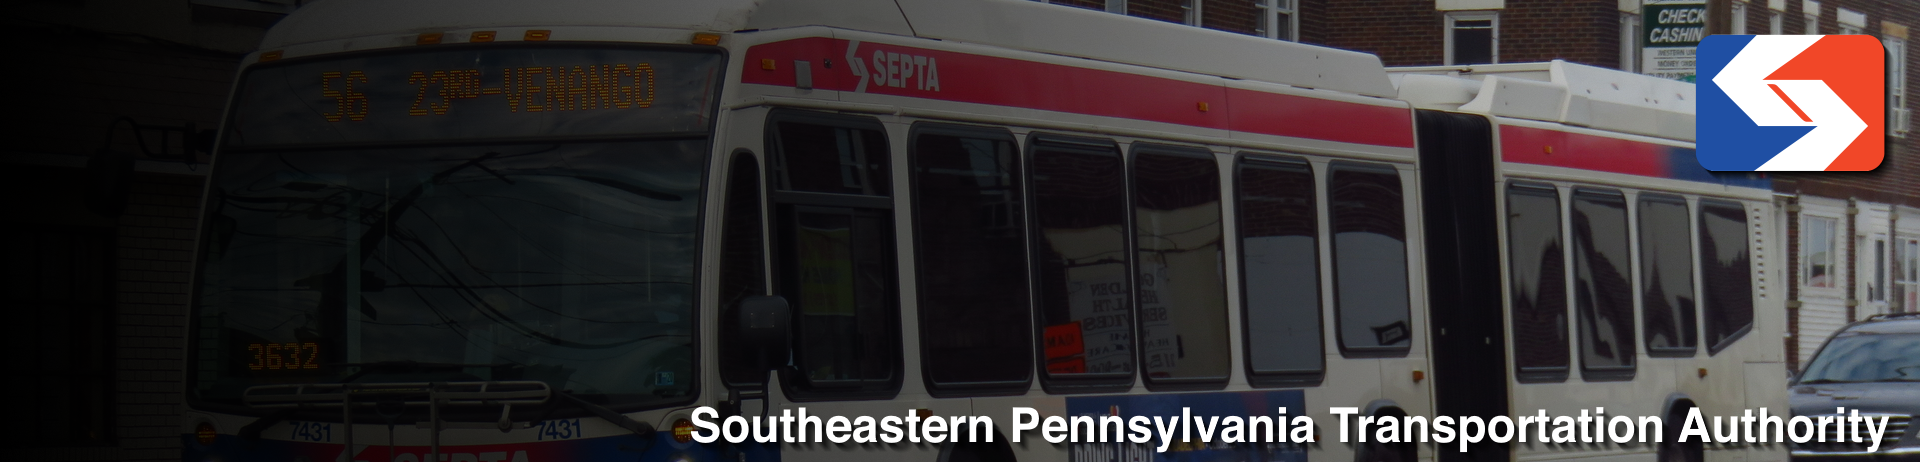 Southeastern Pennsylvania Transportation Authority